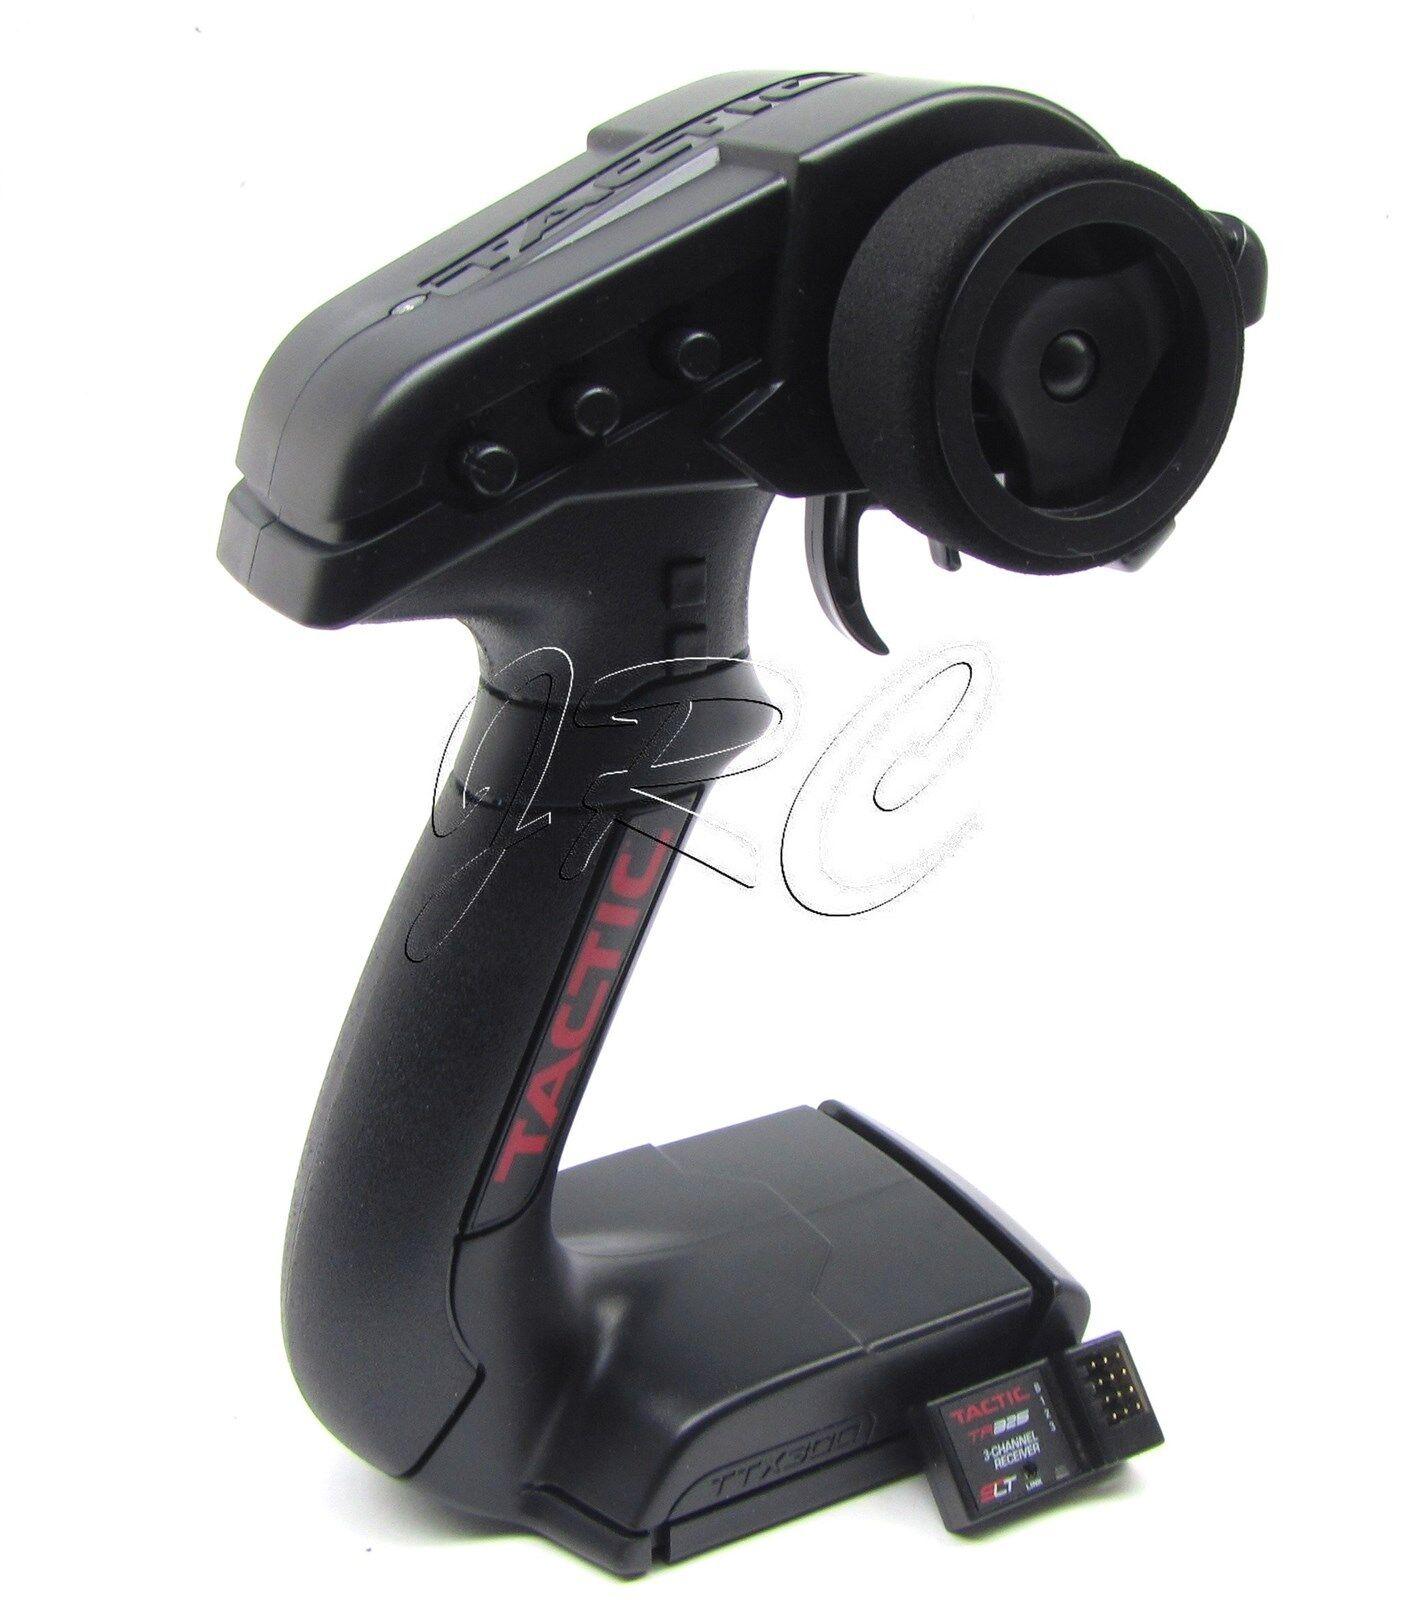 Axial Wraith Tatic Tatic Tatic TTX300 3-Ch RADIO SET 2.4GHz (transmitter receiver AXI90018 b379ae